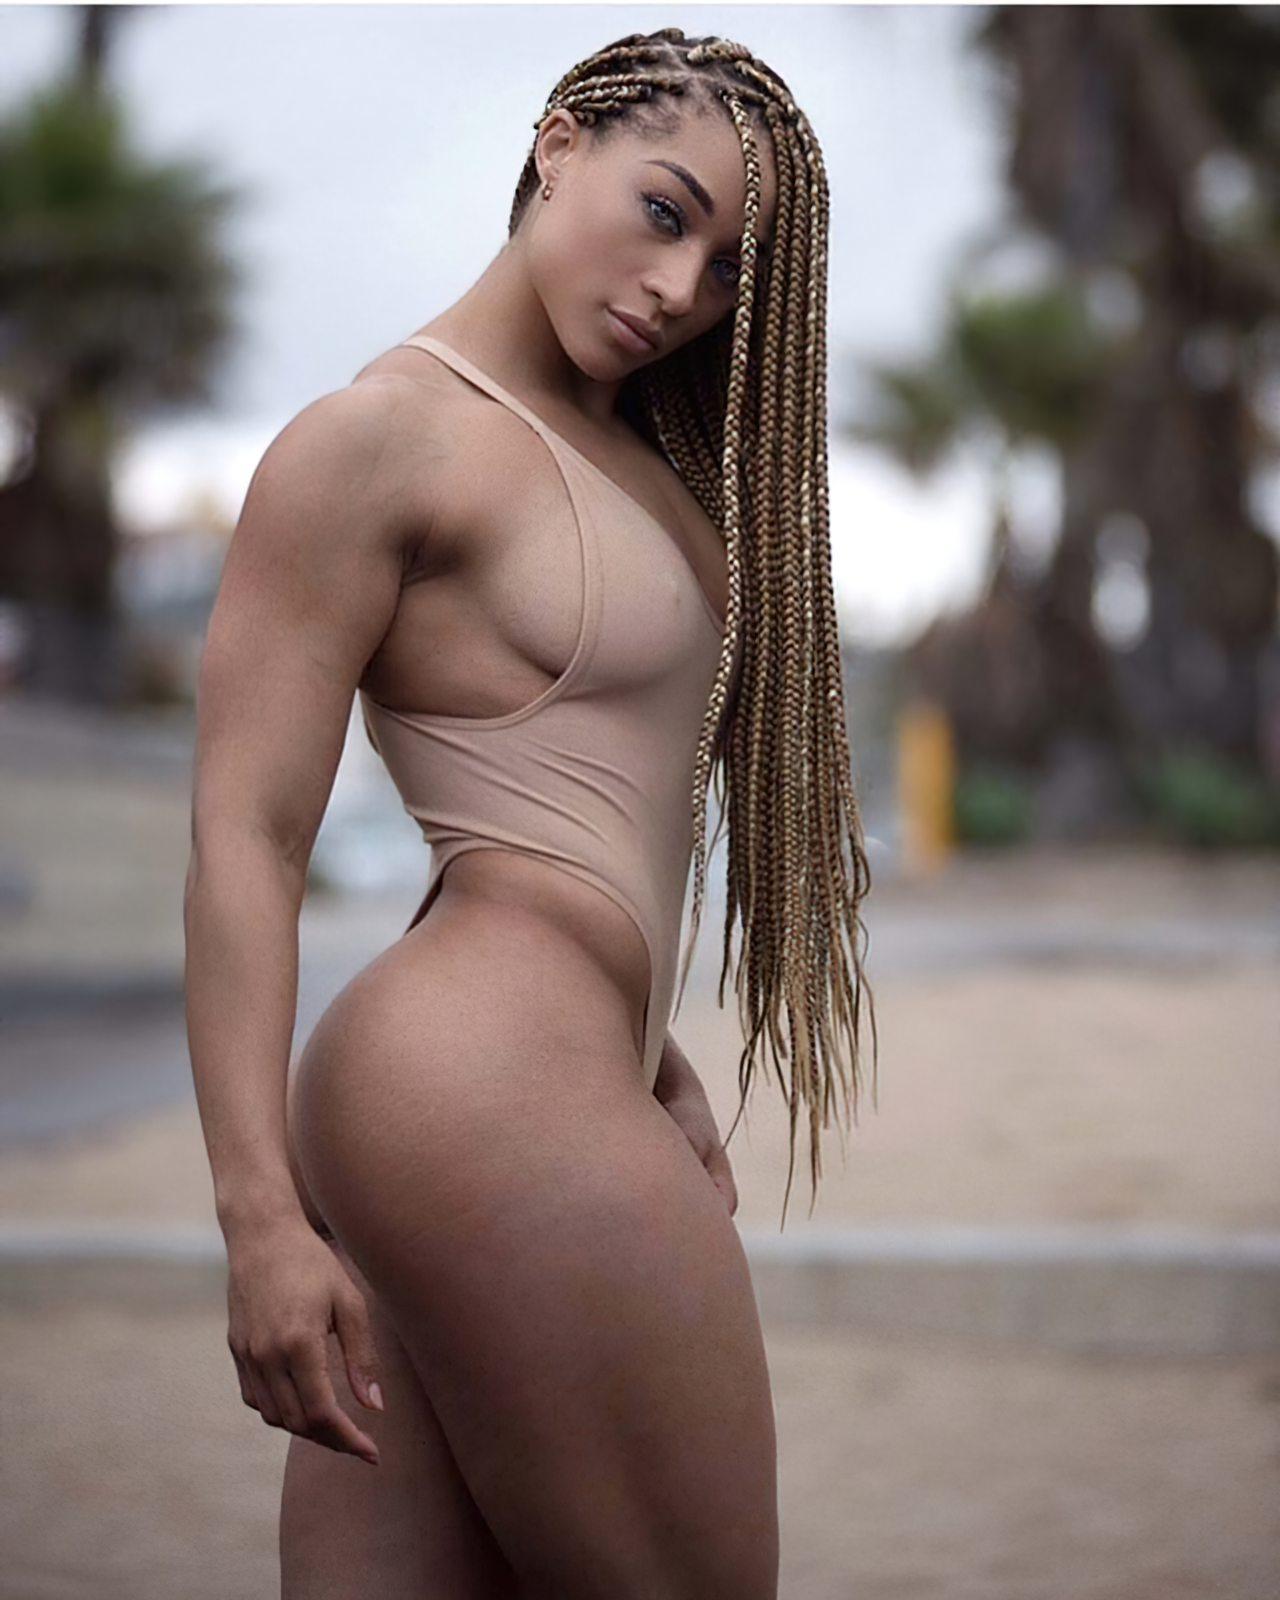 Mulheres Nuas Fotos (47)